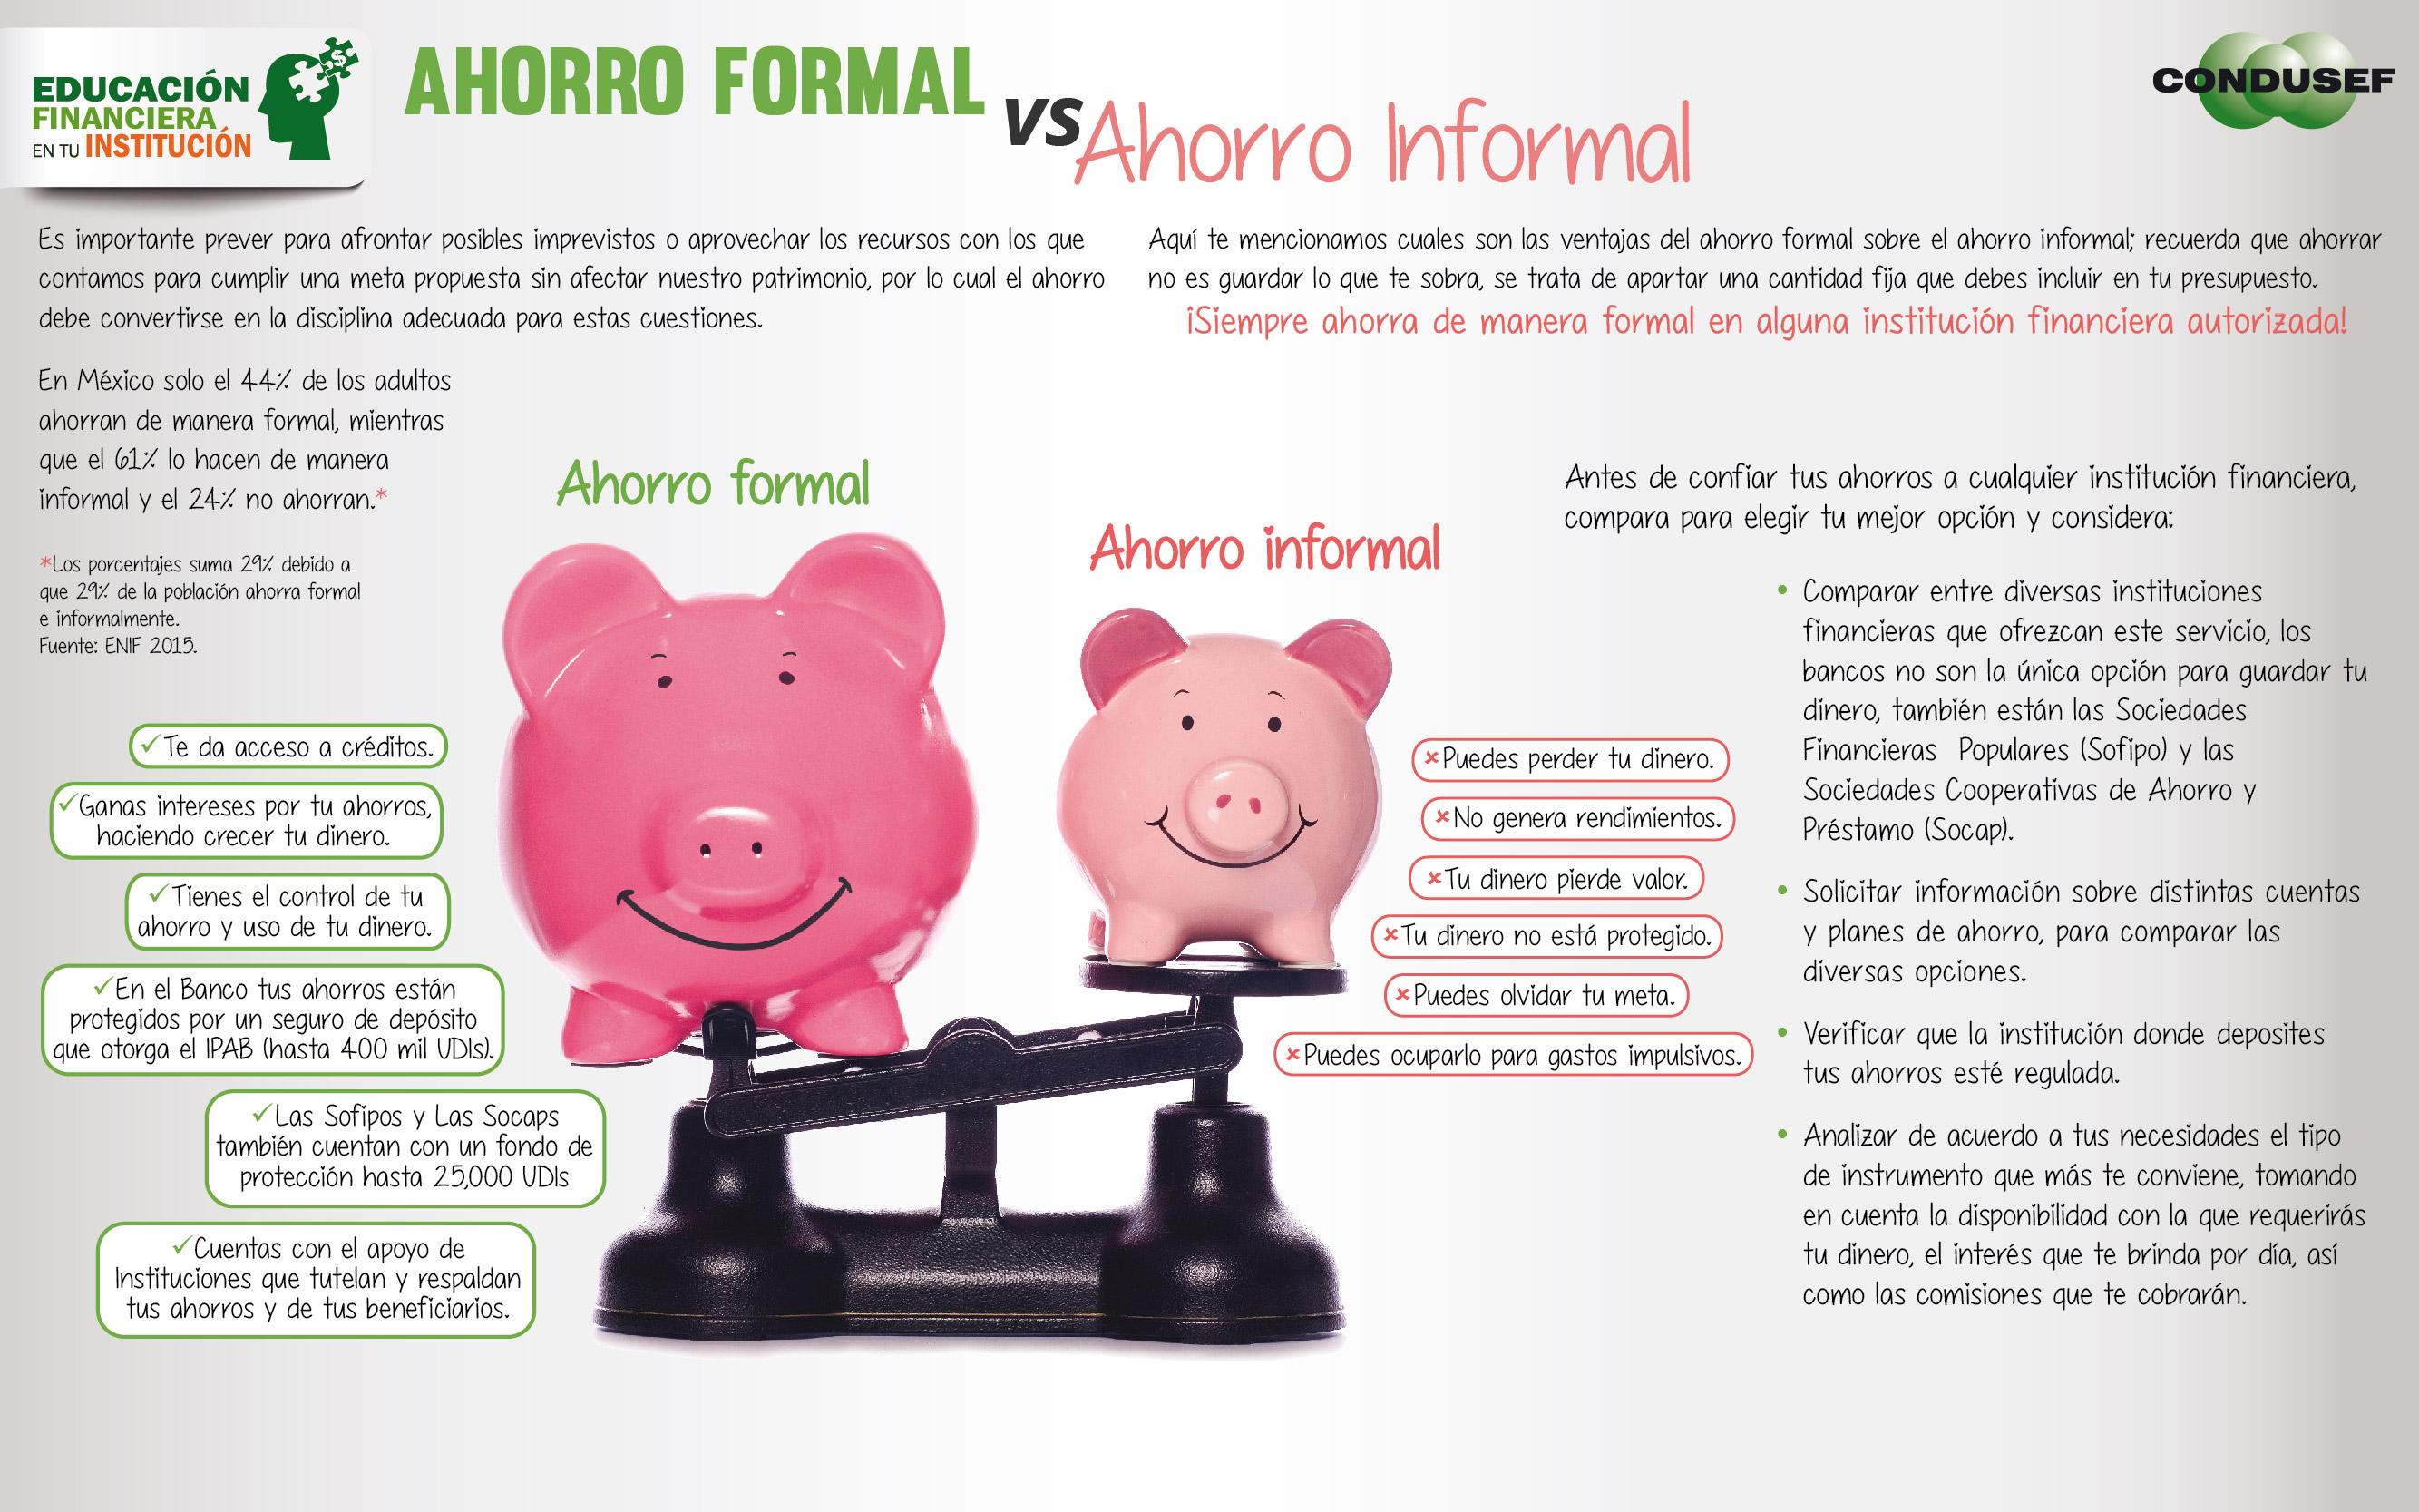 Ahorro formal vs ahorro informal